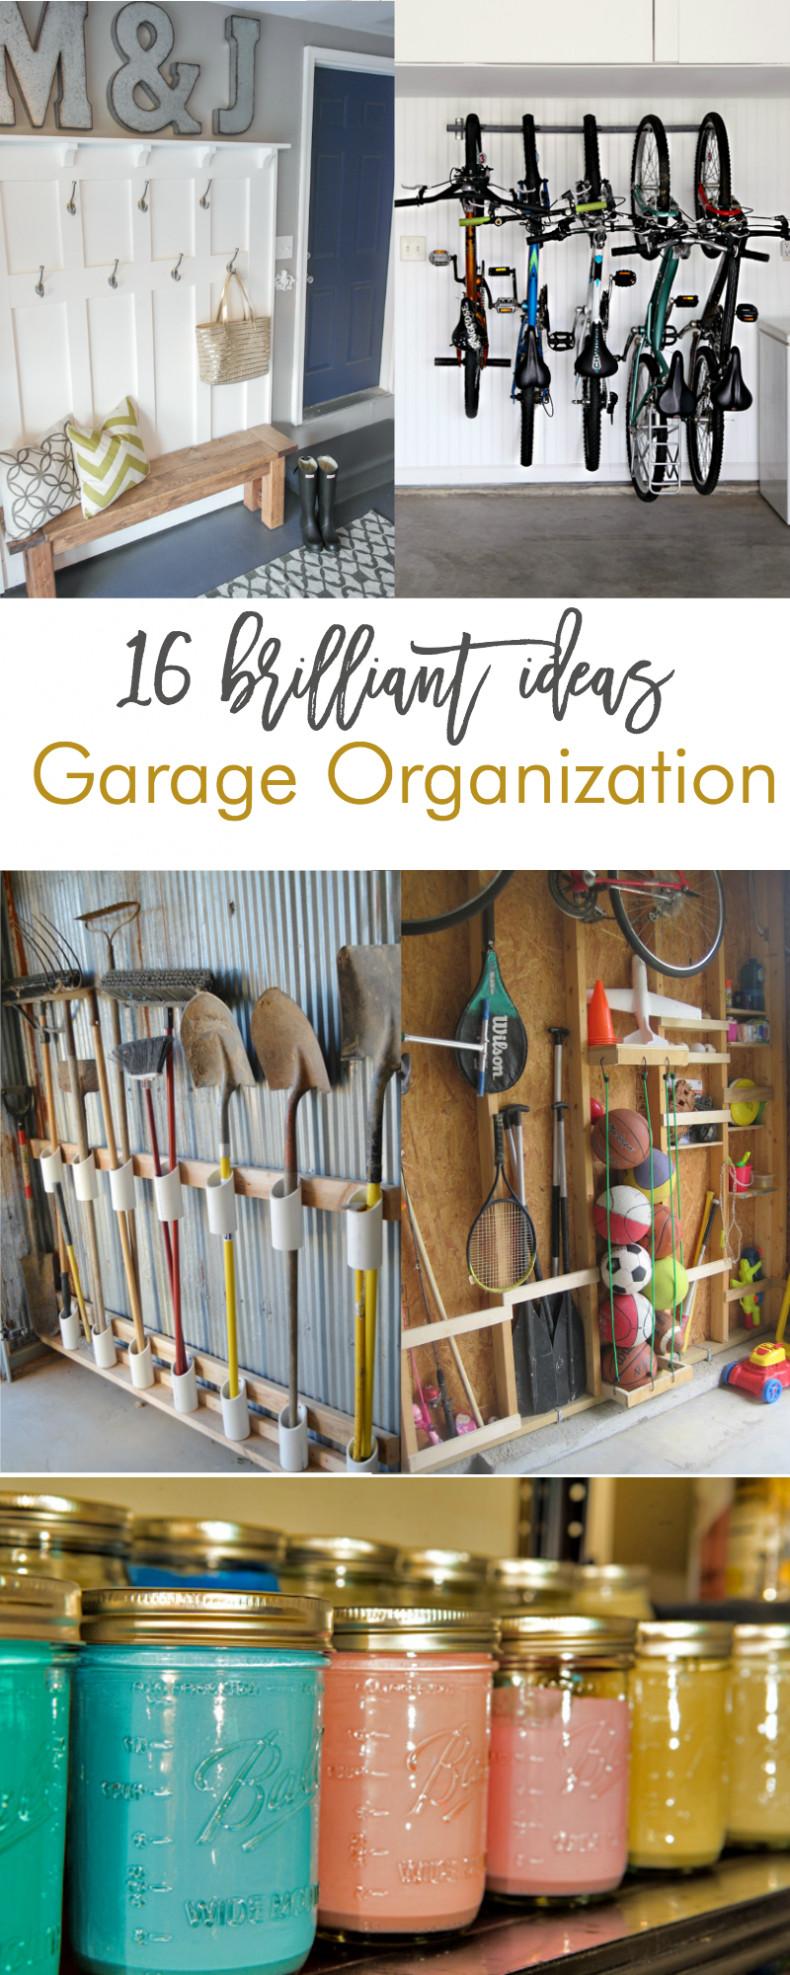 Best ideas about DIY Organization Tips . Save or Pin 16 Brilliant DIY Garage Organization Ideas Now.